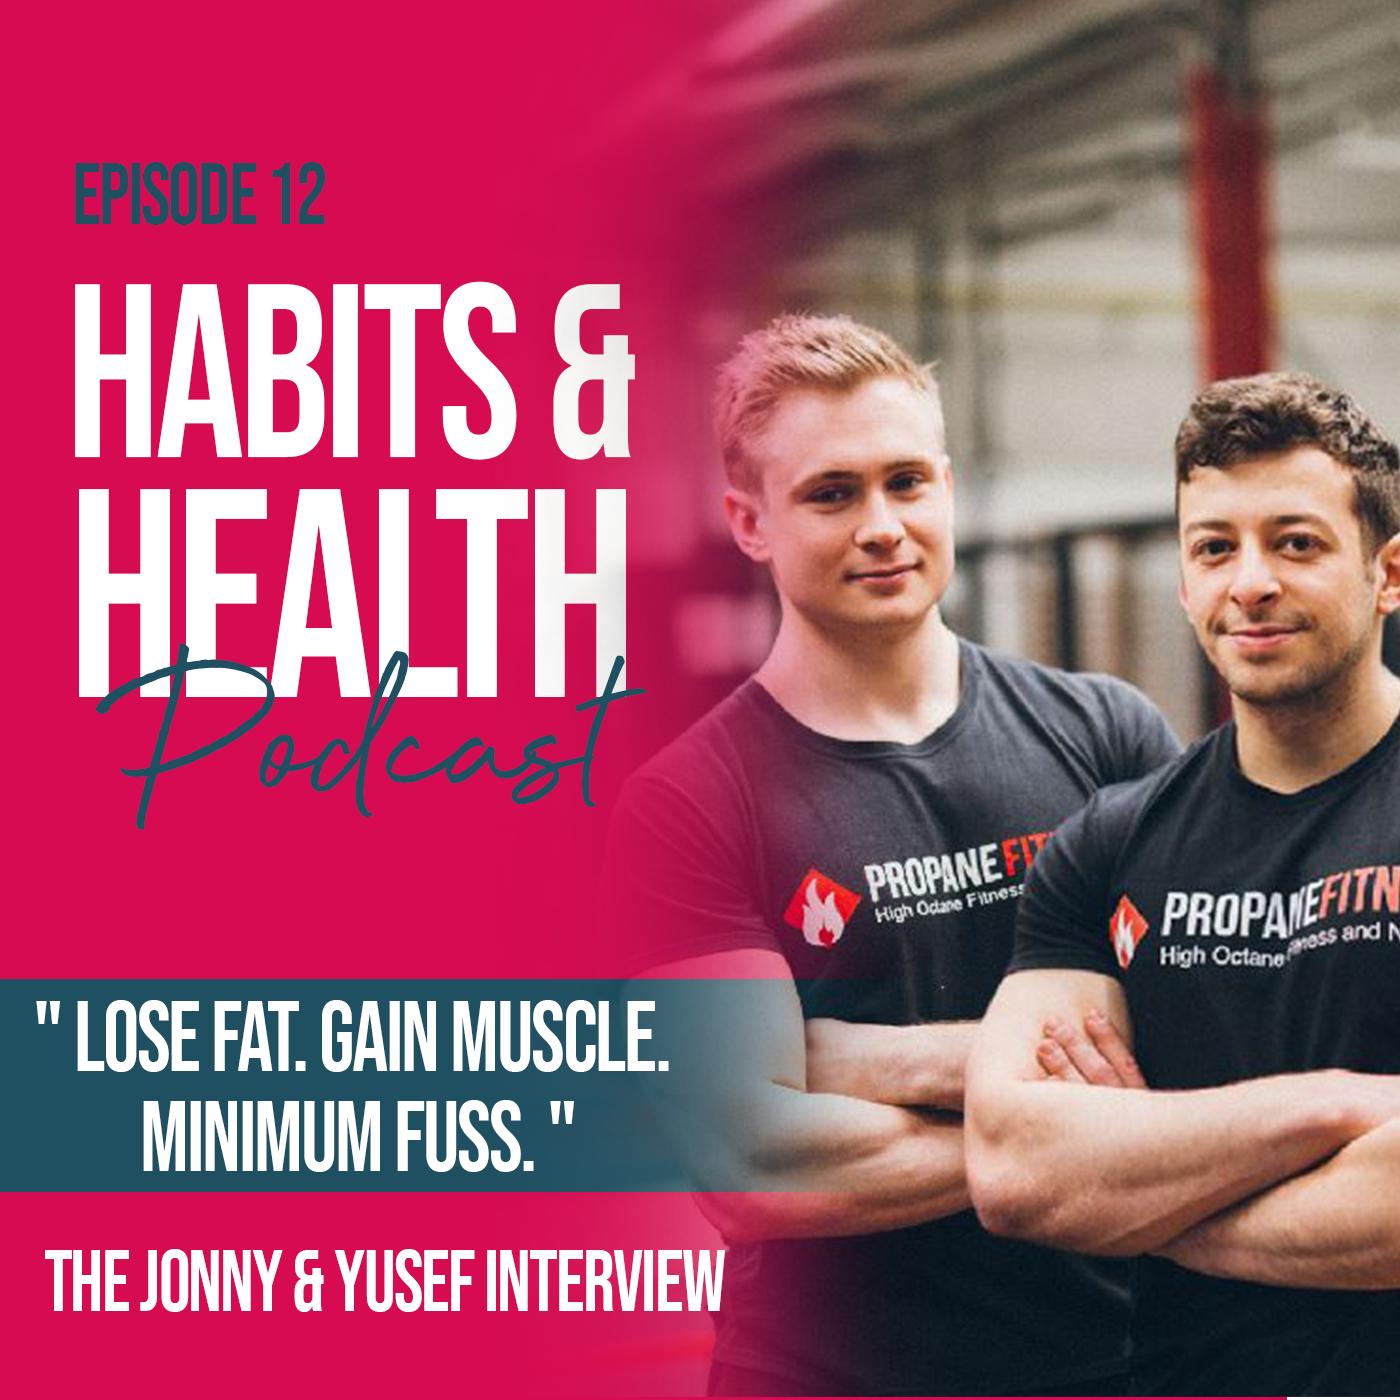 Habits & Health episode 12 Jonny & Yusef